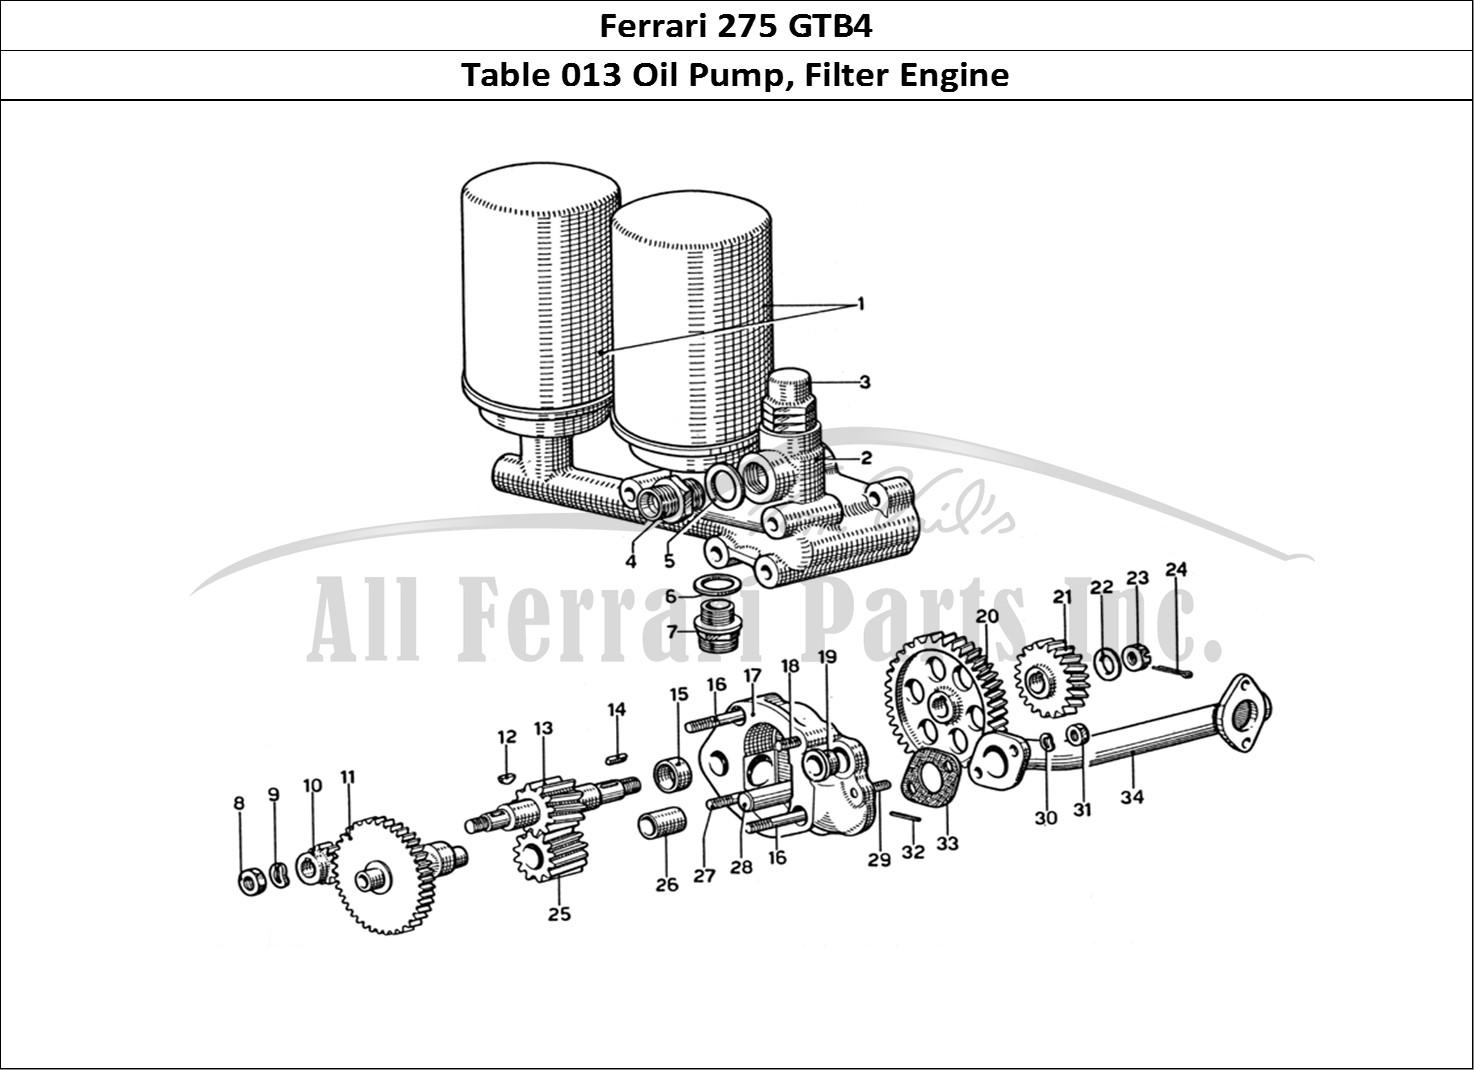 Buy Original Ferrari 275 Gtb4 013 Oil Pump Filter Engine